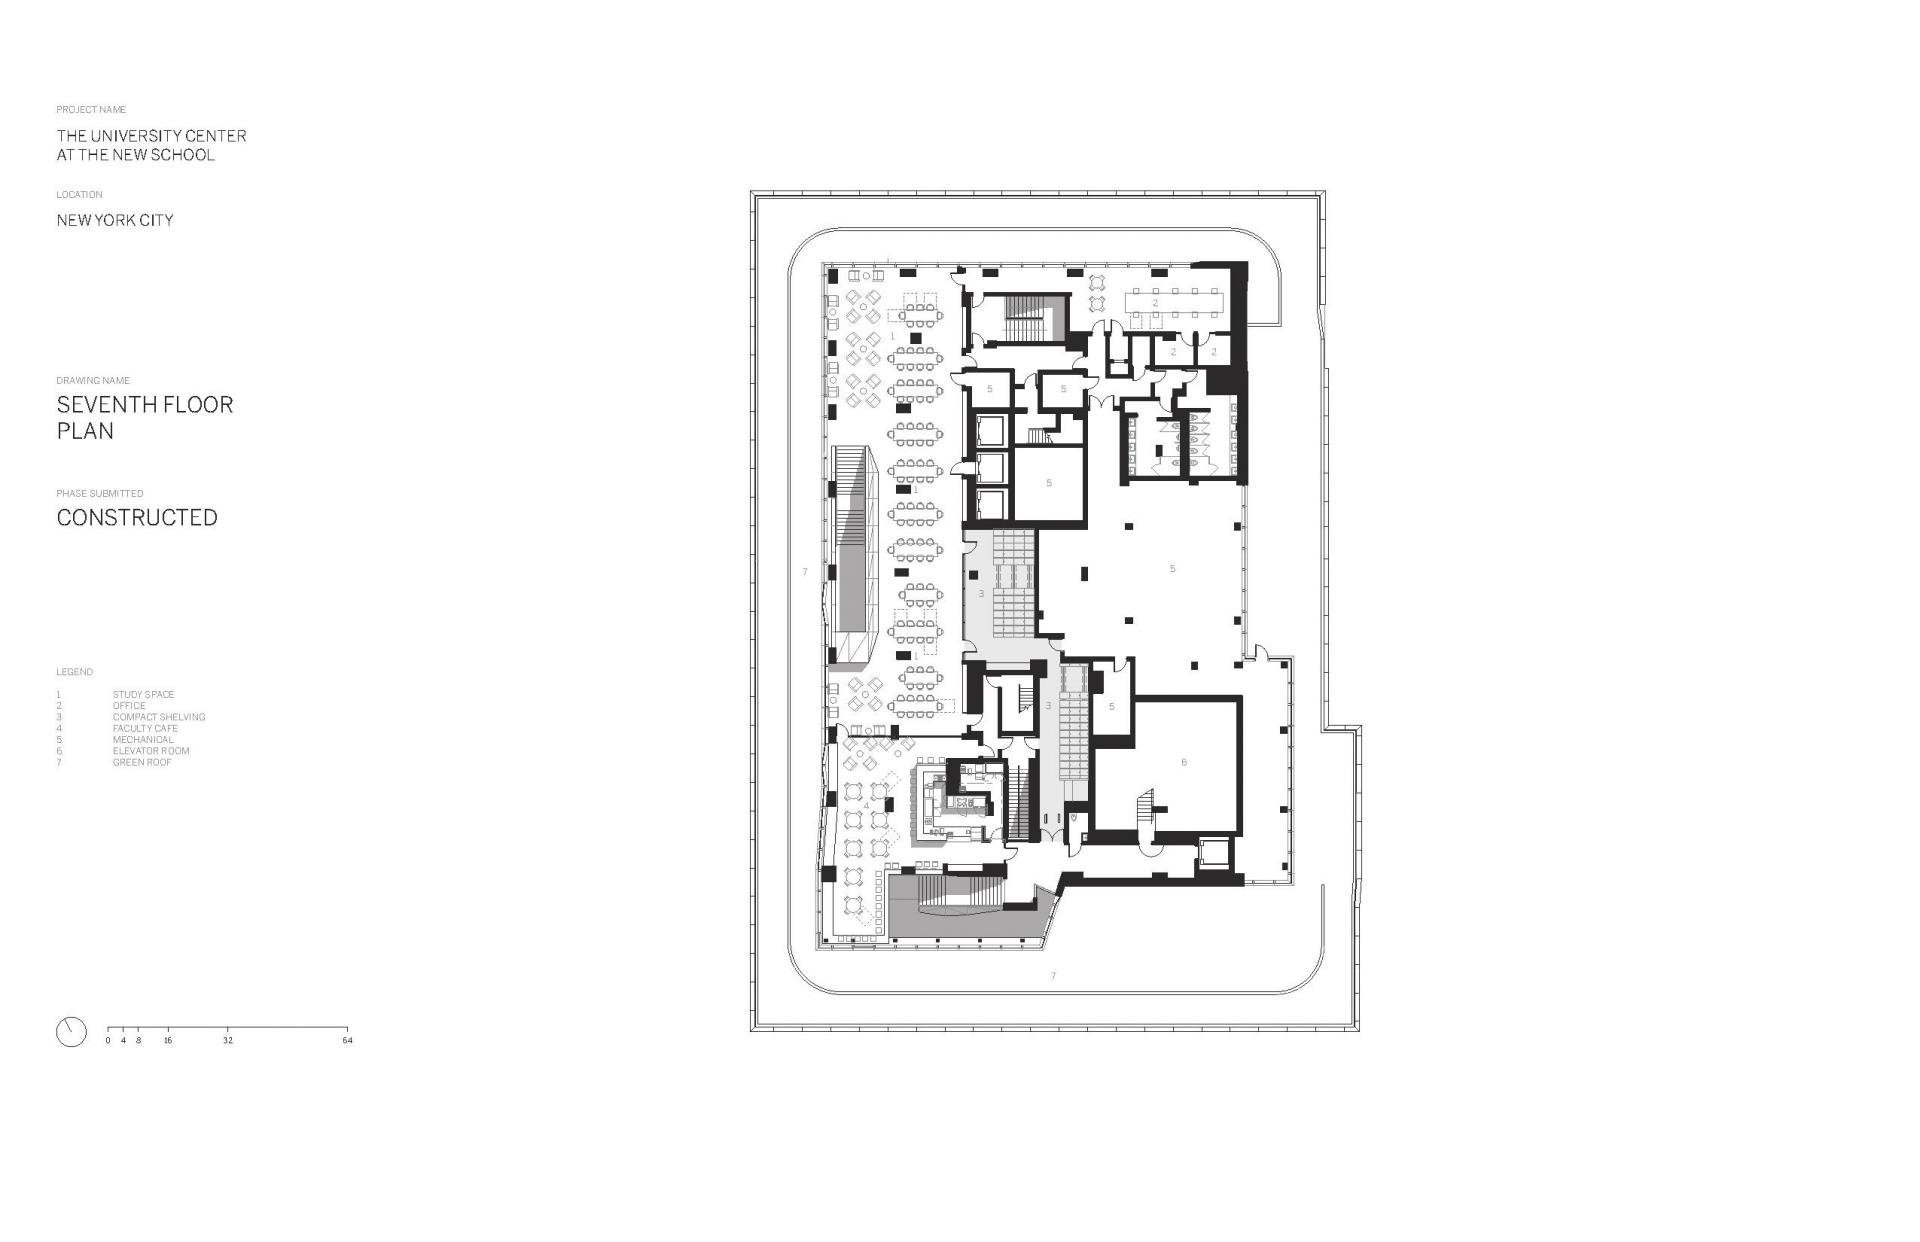 Схема учебного центра Greenwich Village в Нью Йорке - Фото 8